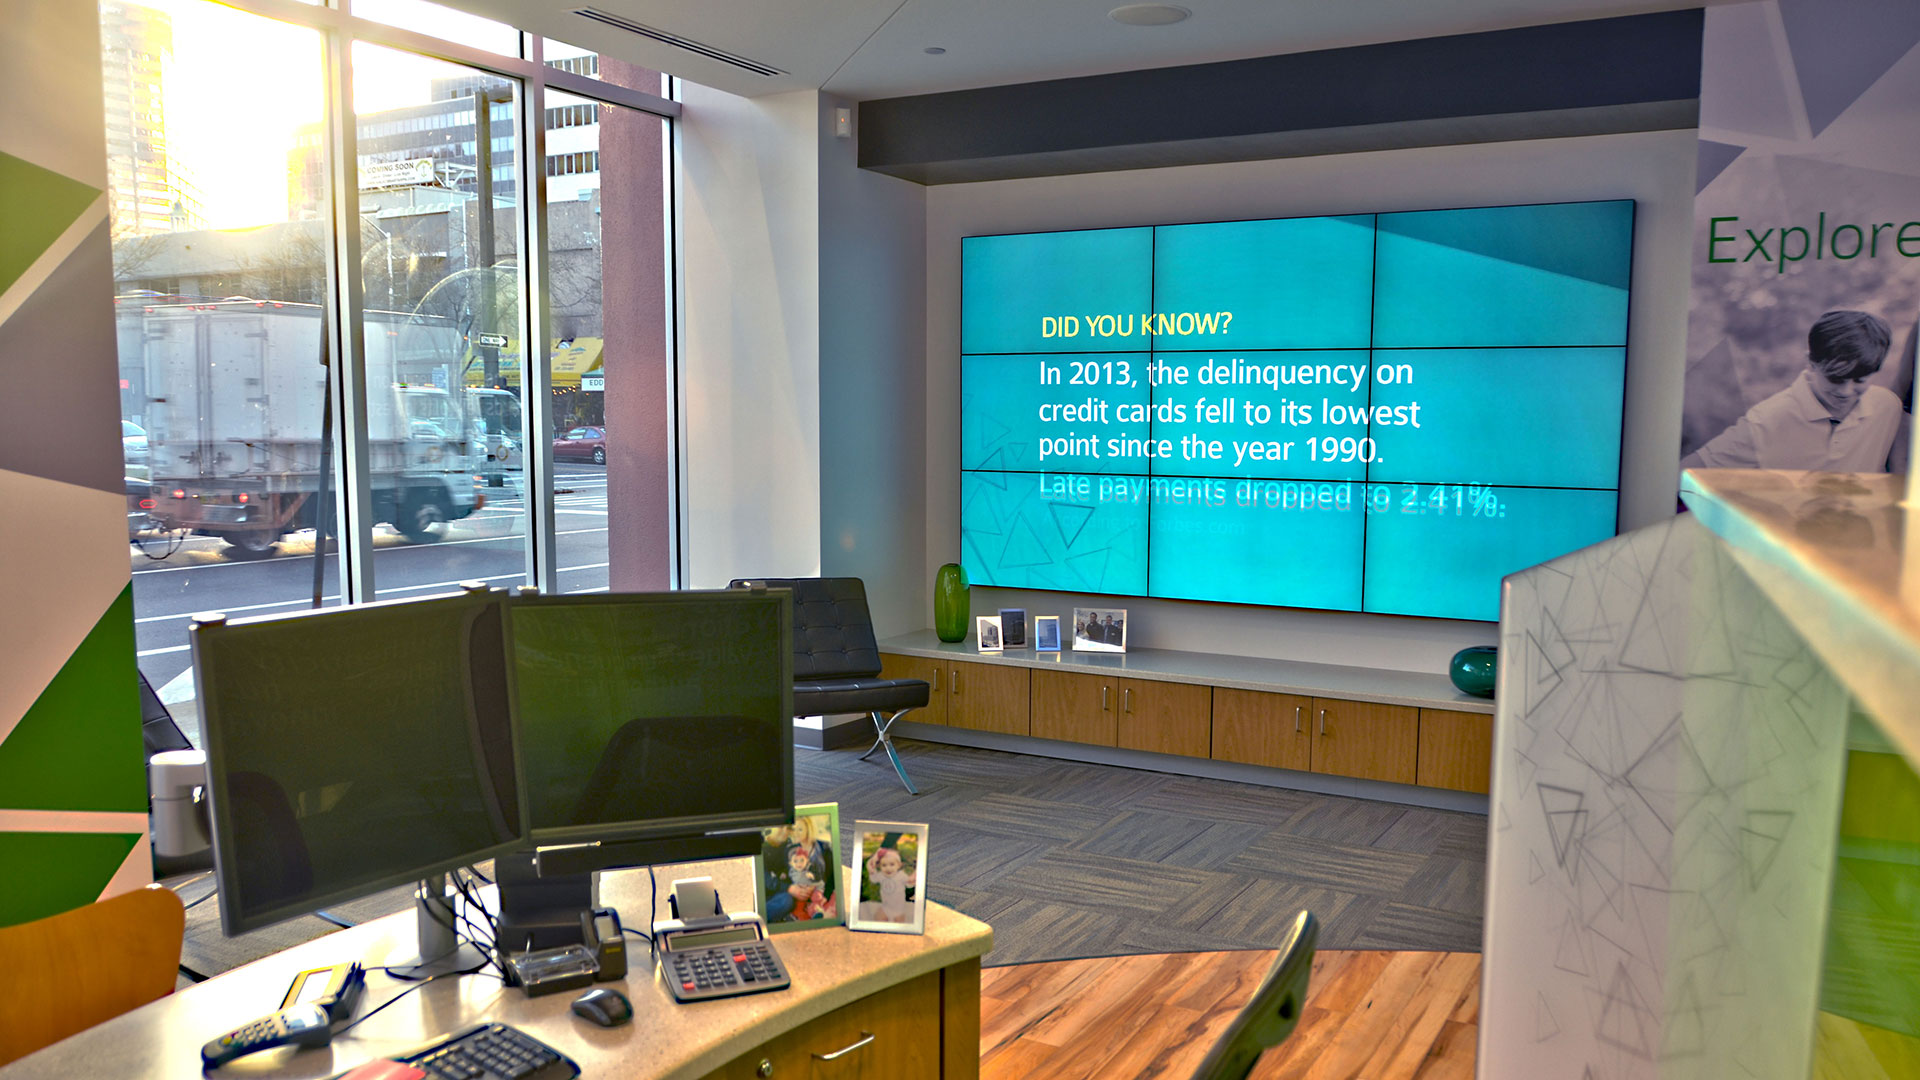 digital signage retail media solutions codigo s multi screen video wall installation